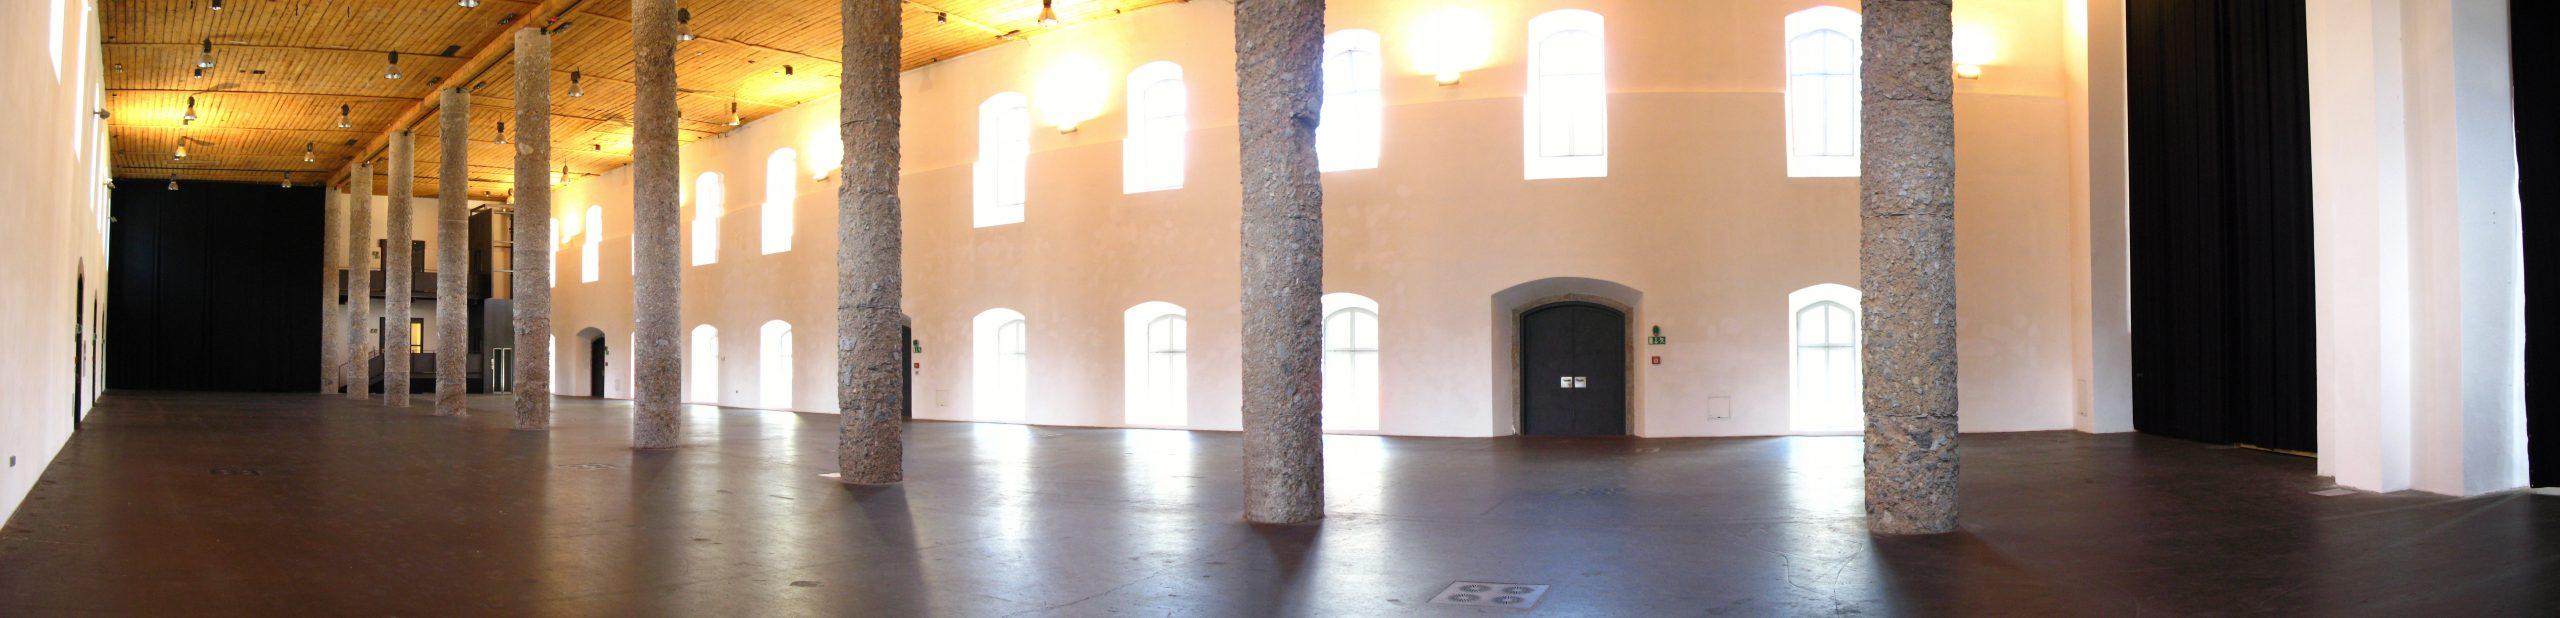 Salzlager Hall = Best Event Location